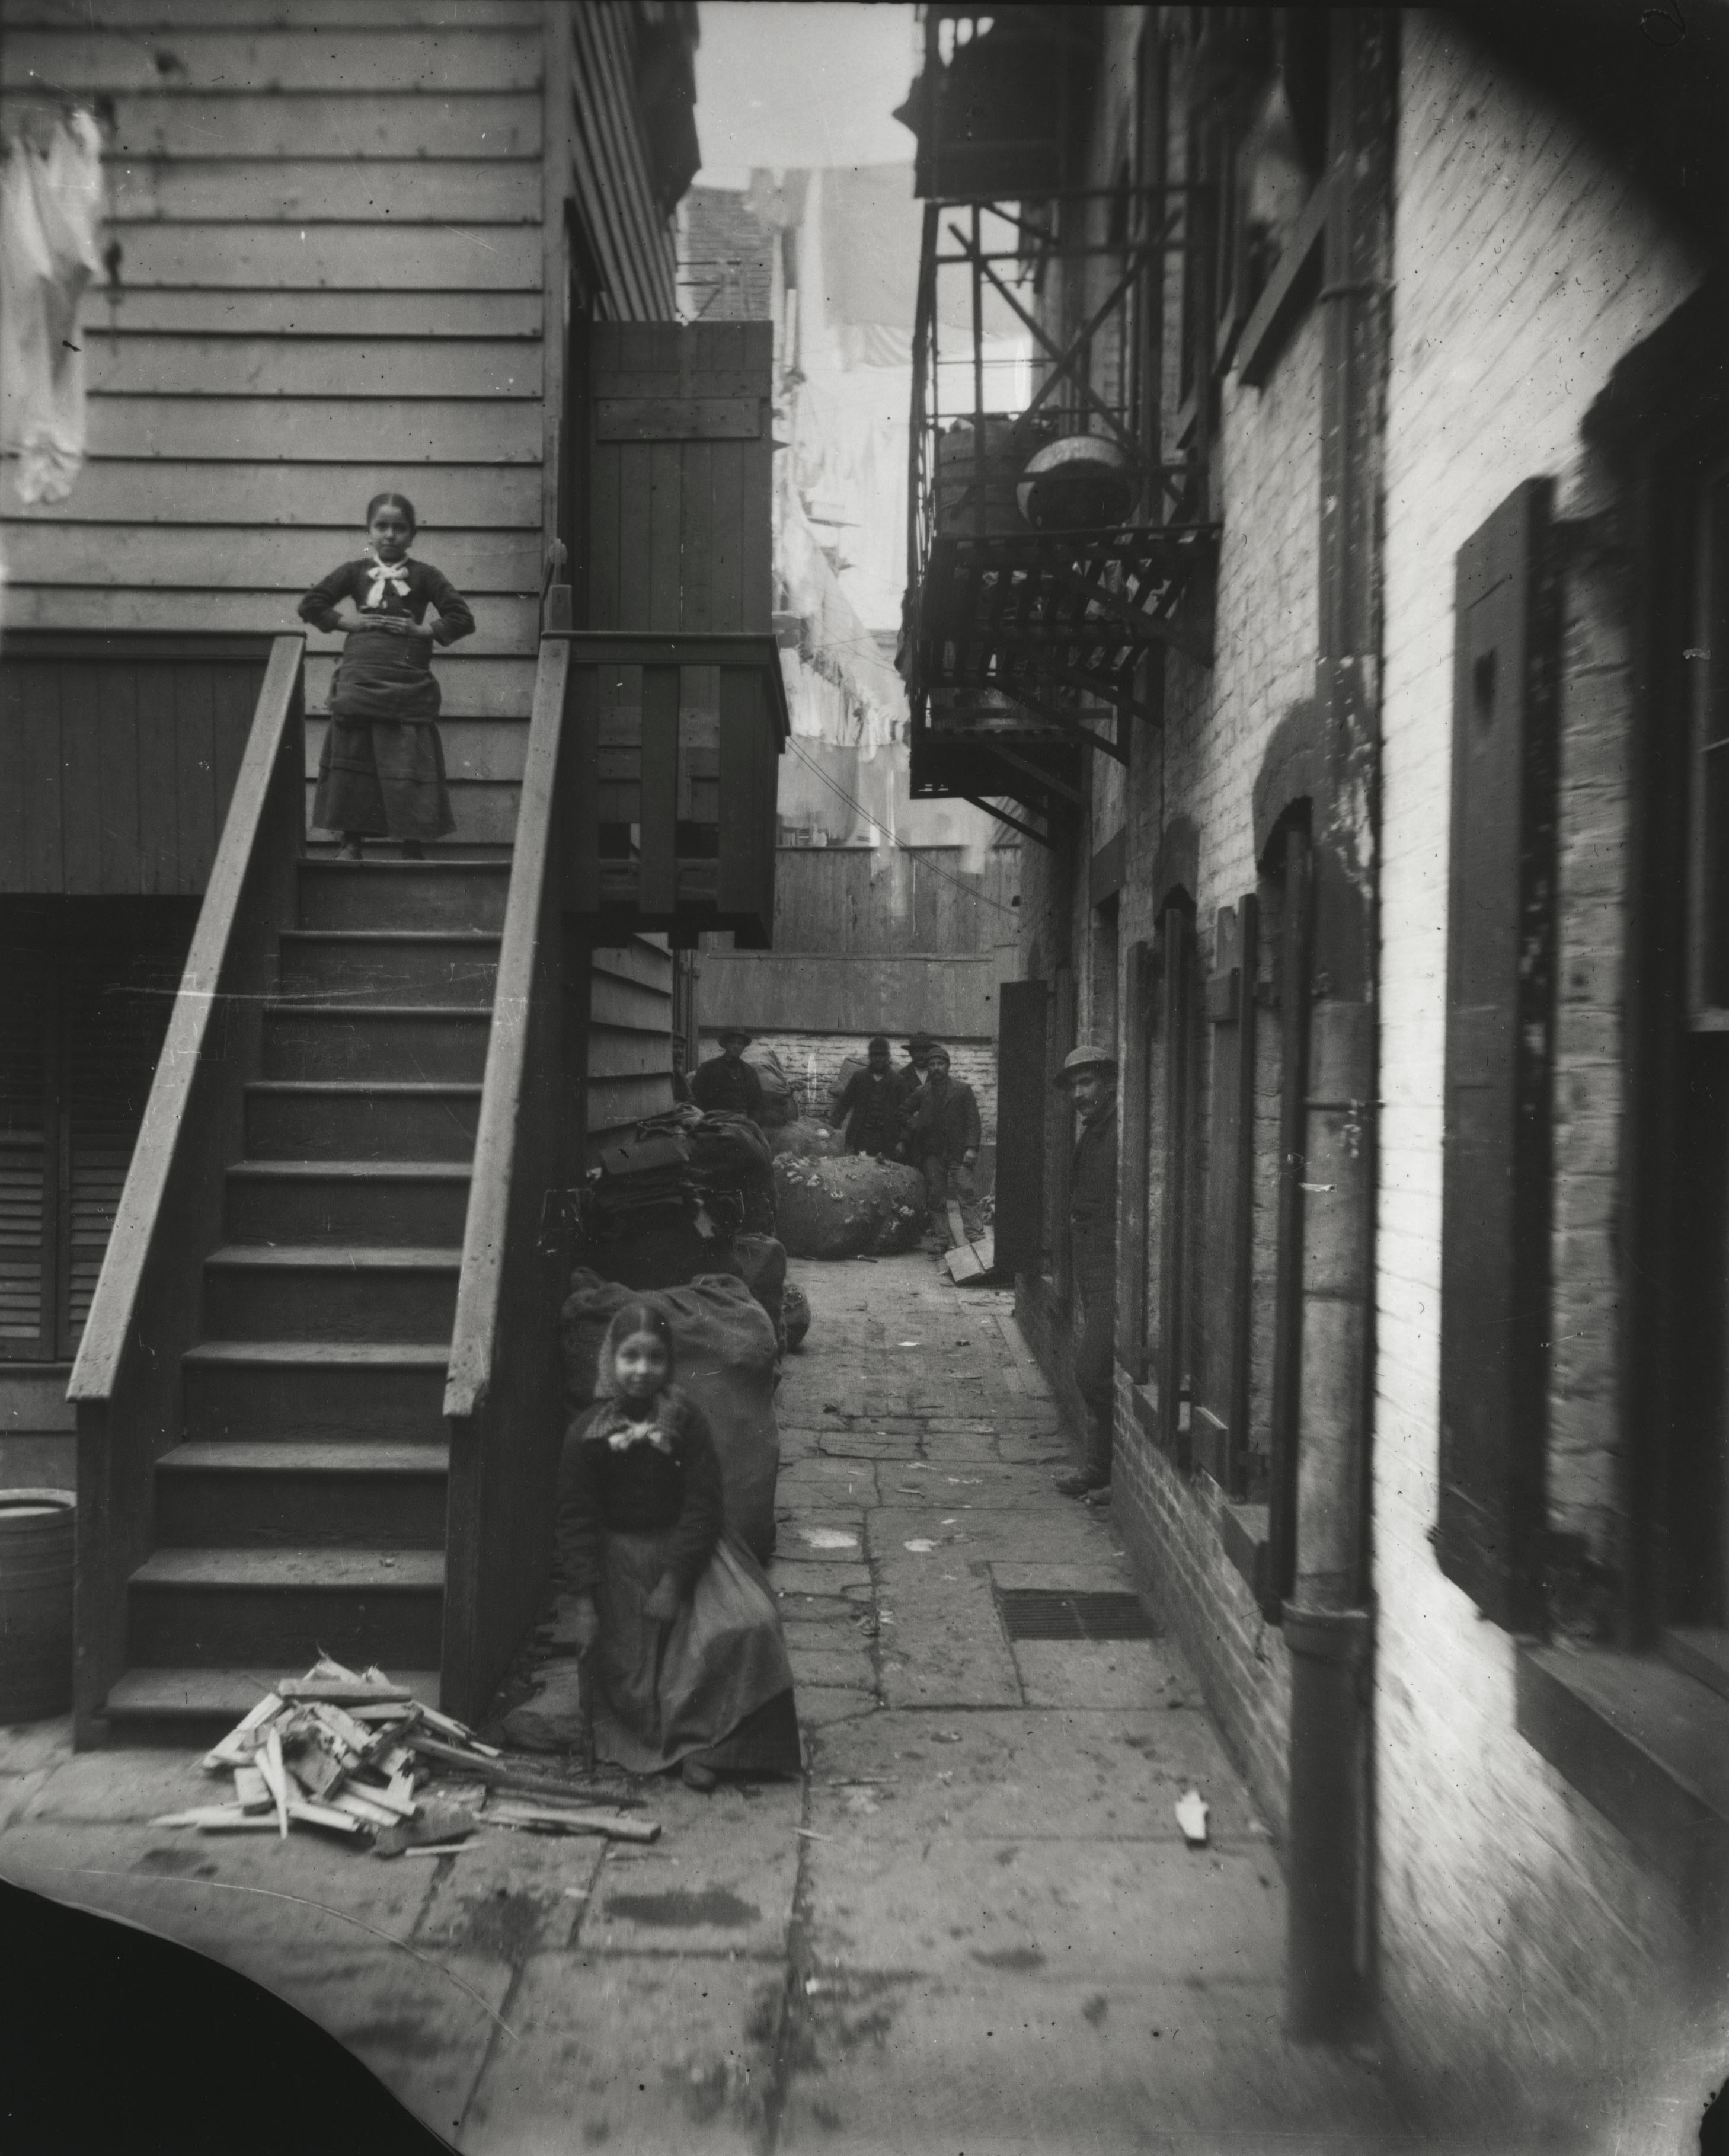 Baxter Street in Mulberry Bend. Via Preus Museum